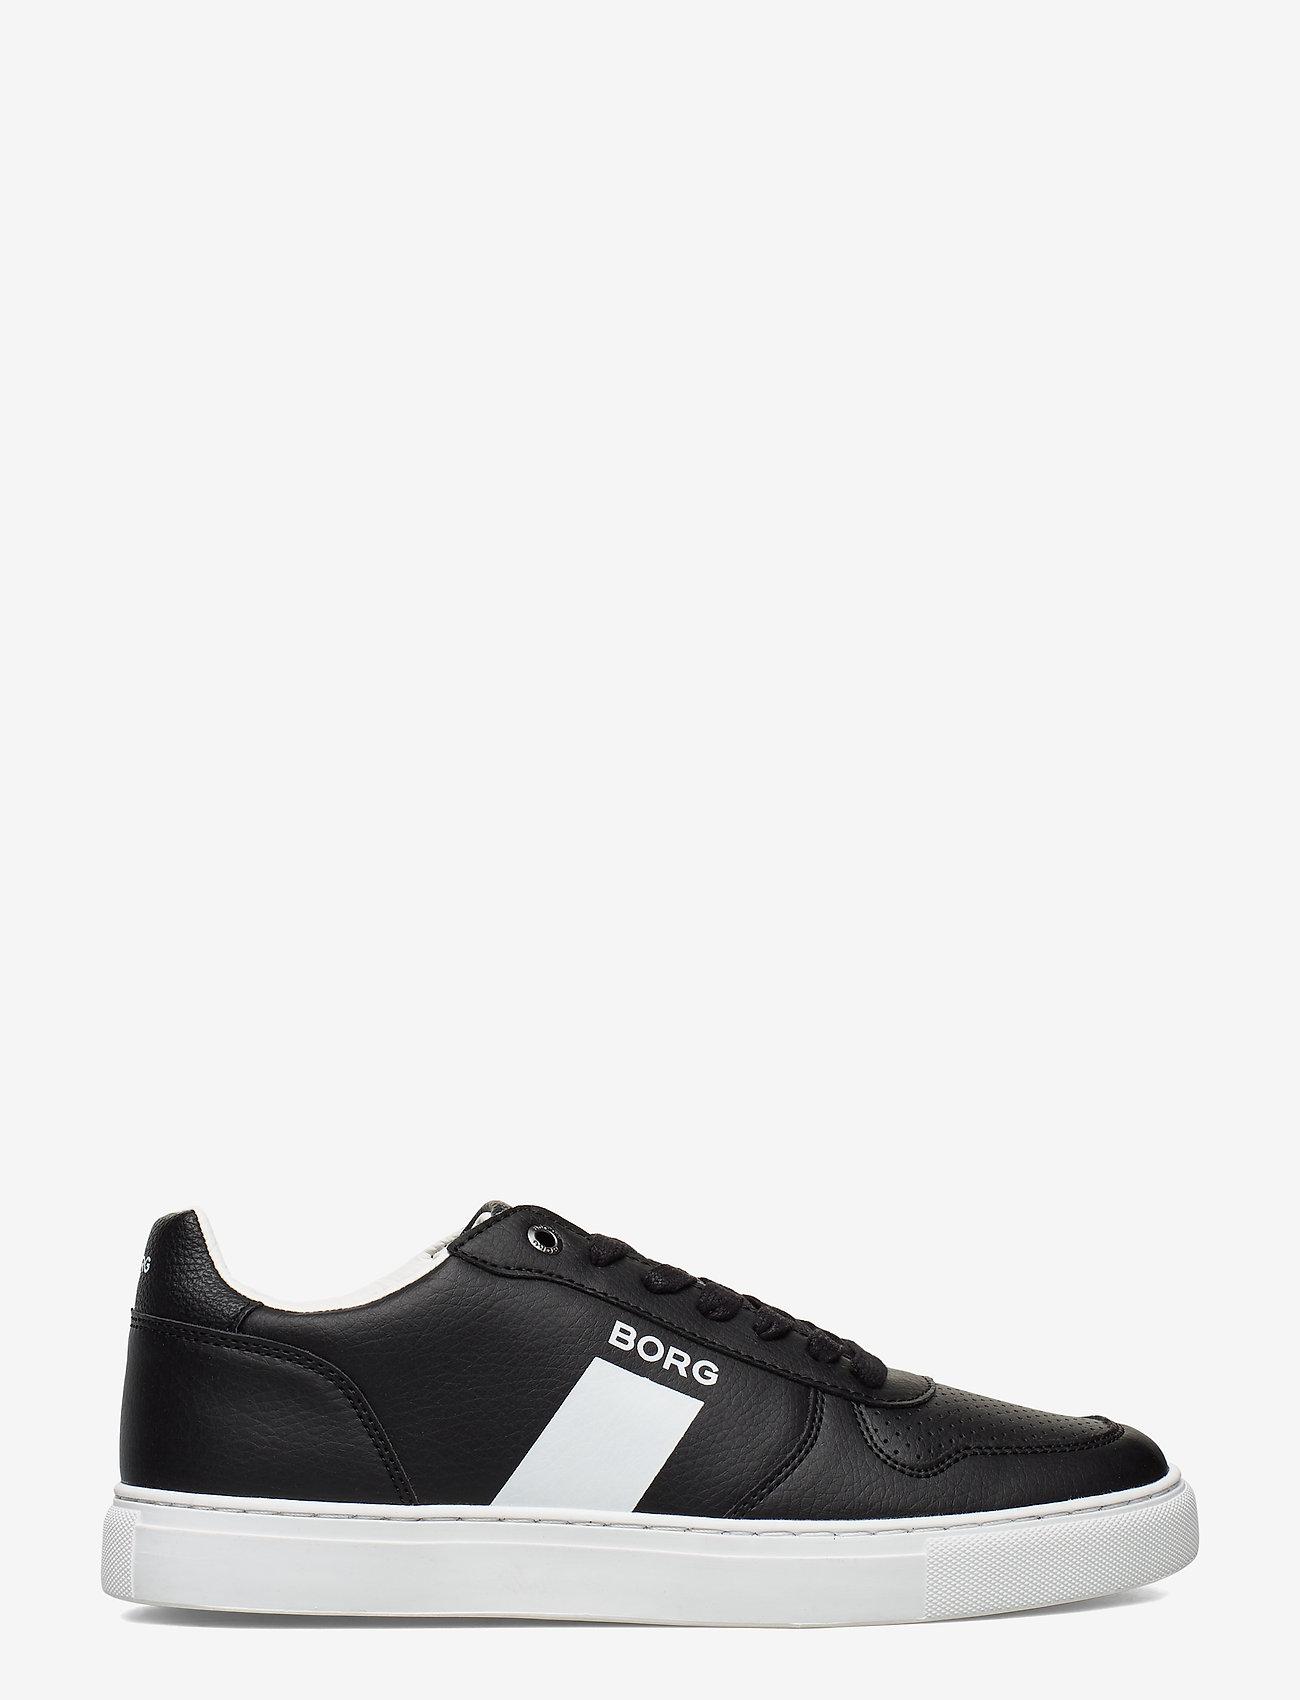 Björn Borg - T220 LOW TMP M - laag sneakers - black-white - 1